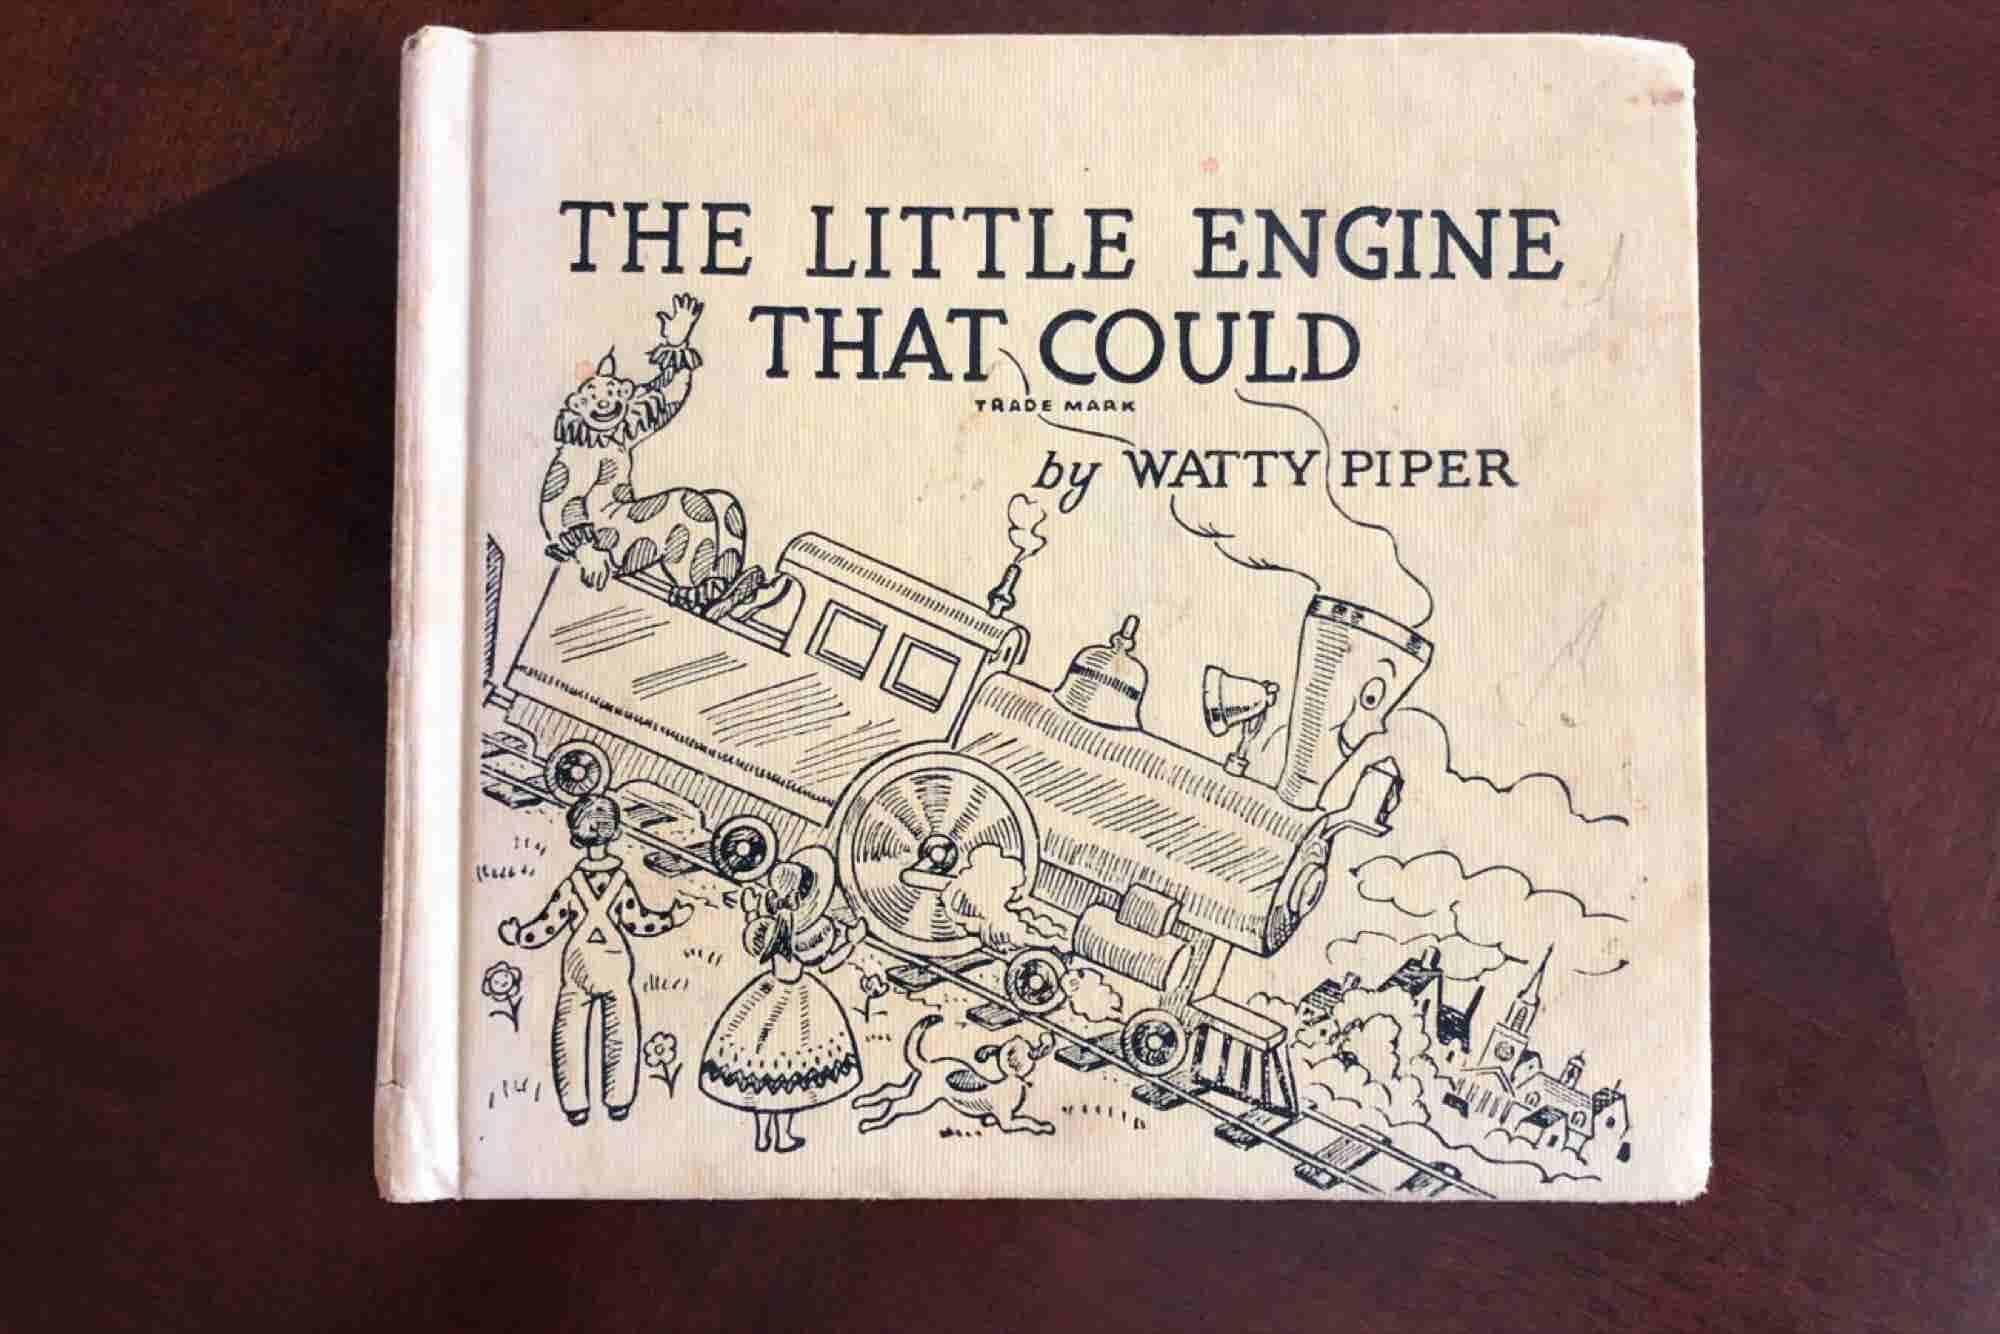 How a Classic Children's Book Motivates an Entrepreneur to Chug Throug...